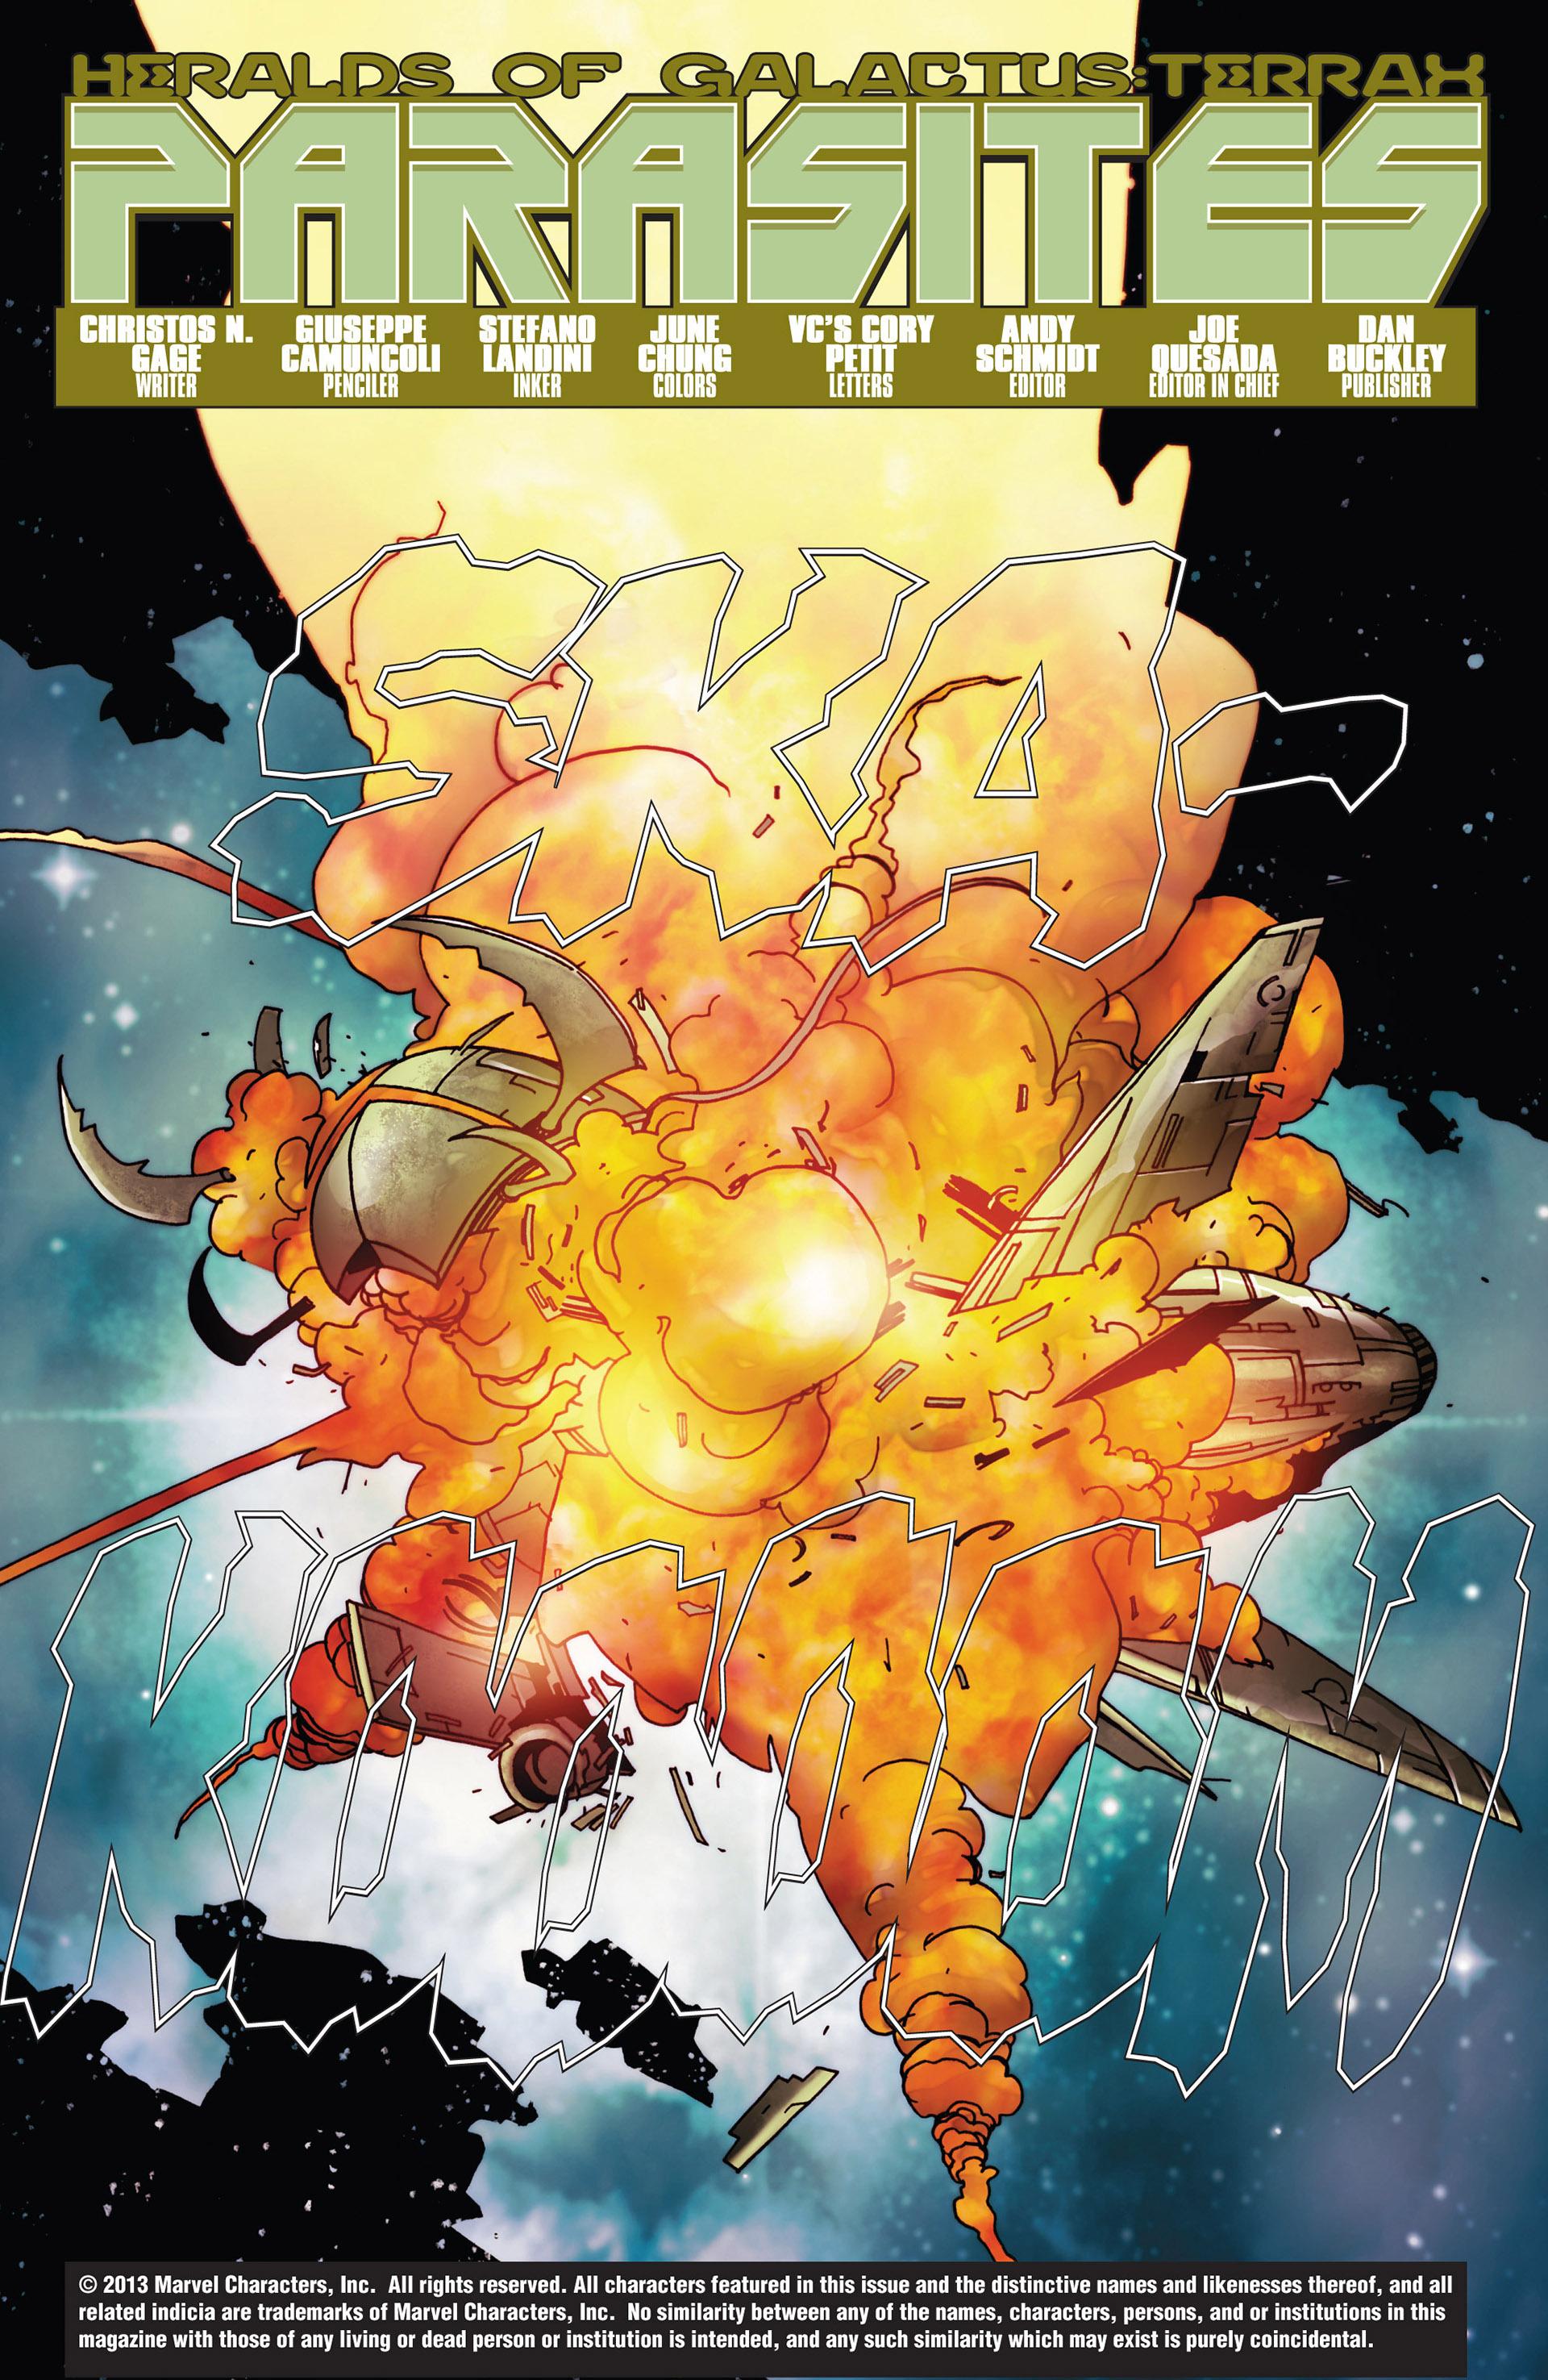 Read online Annihilation: Heralds Of Galactus comic -  Issue #1 - 4